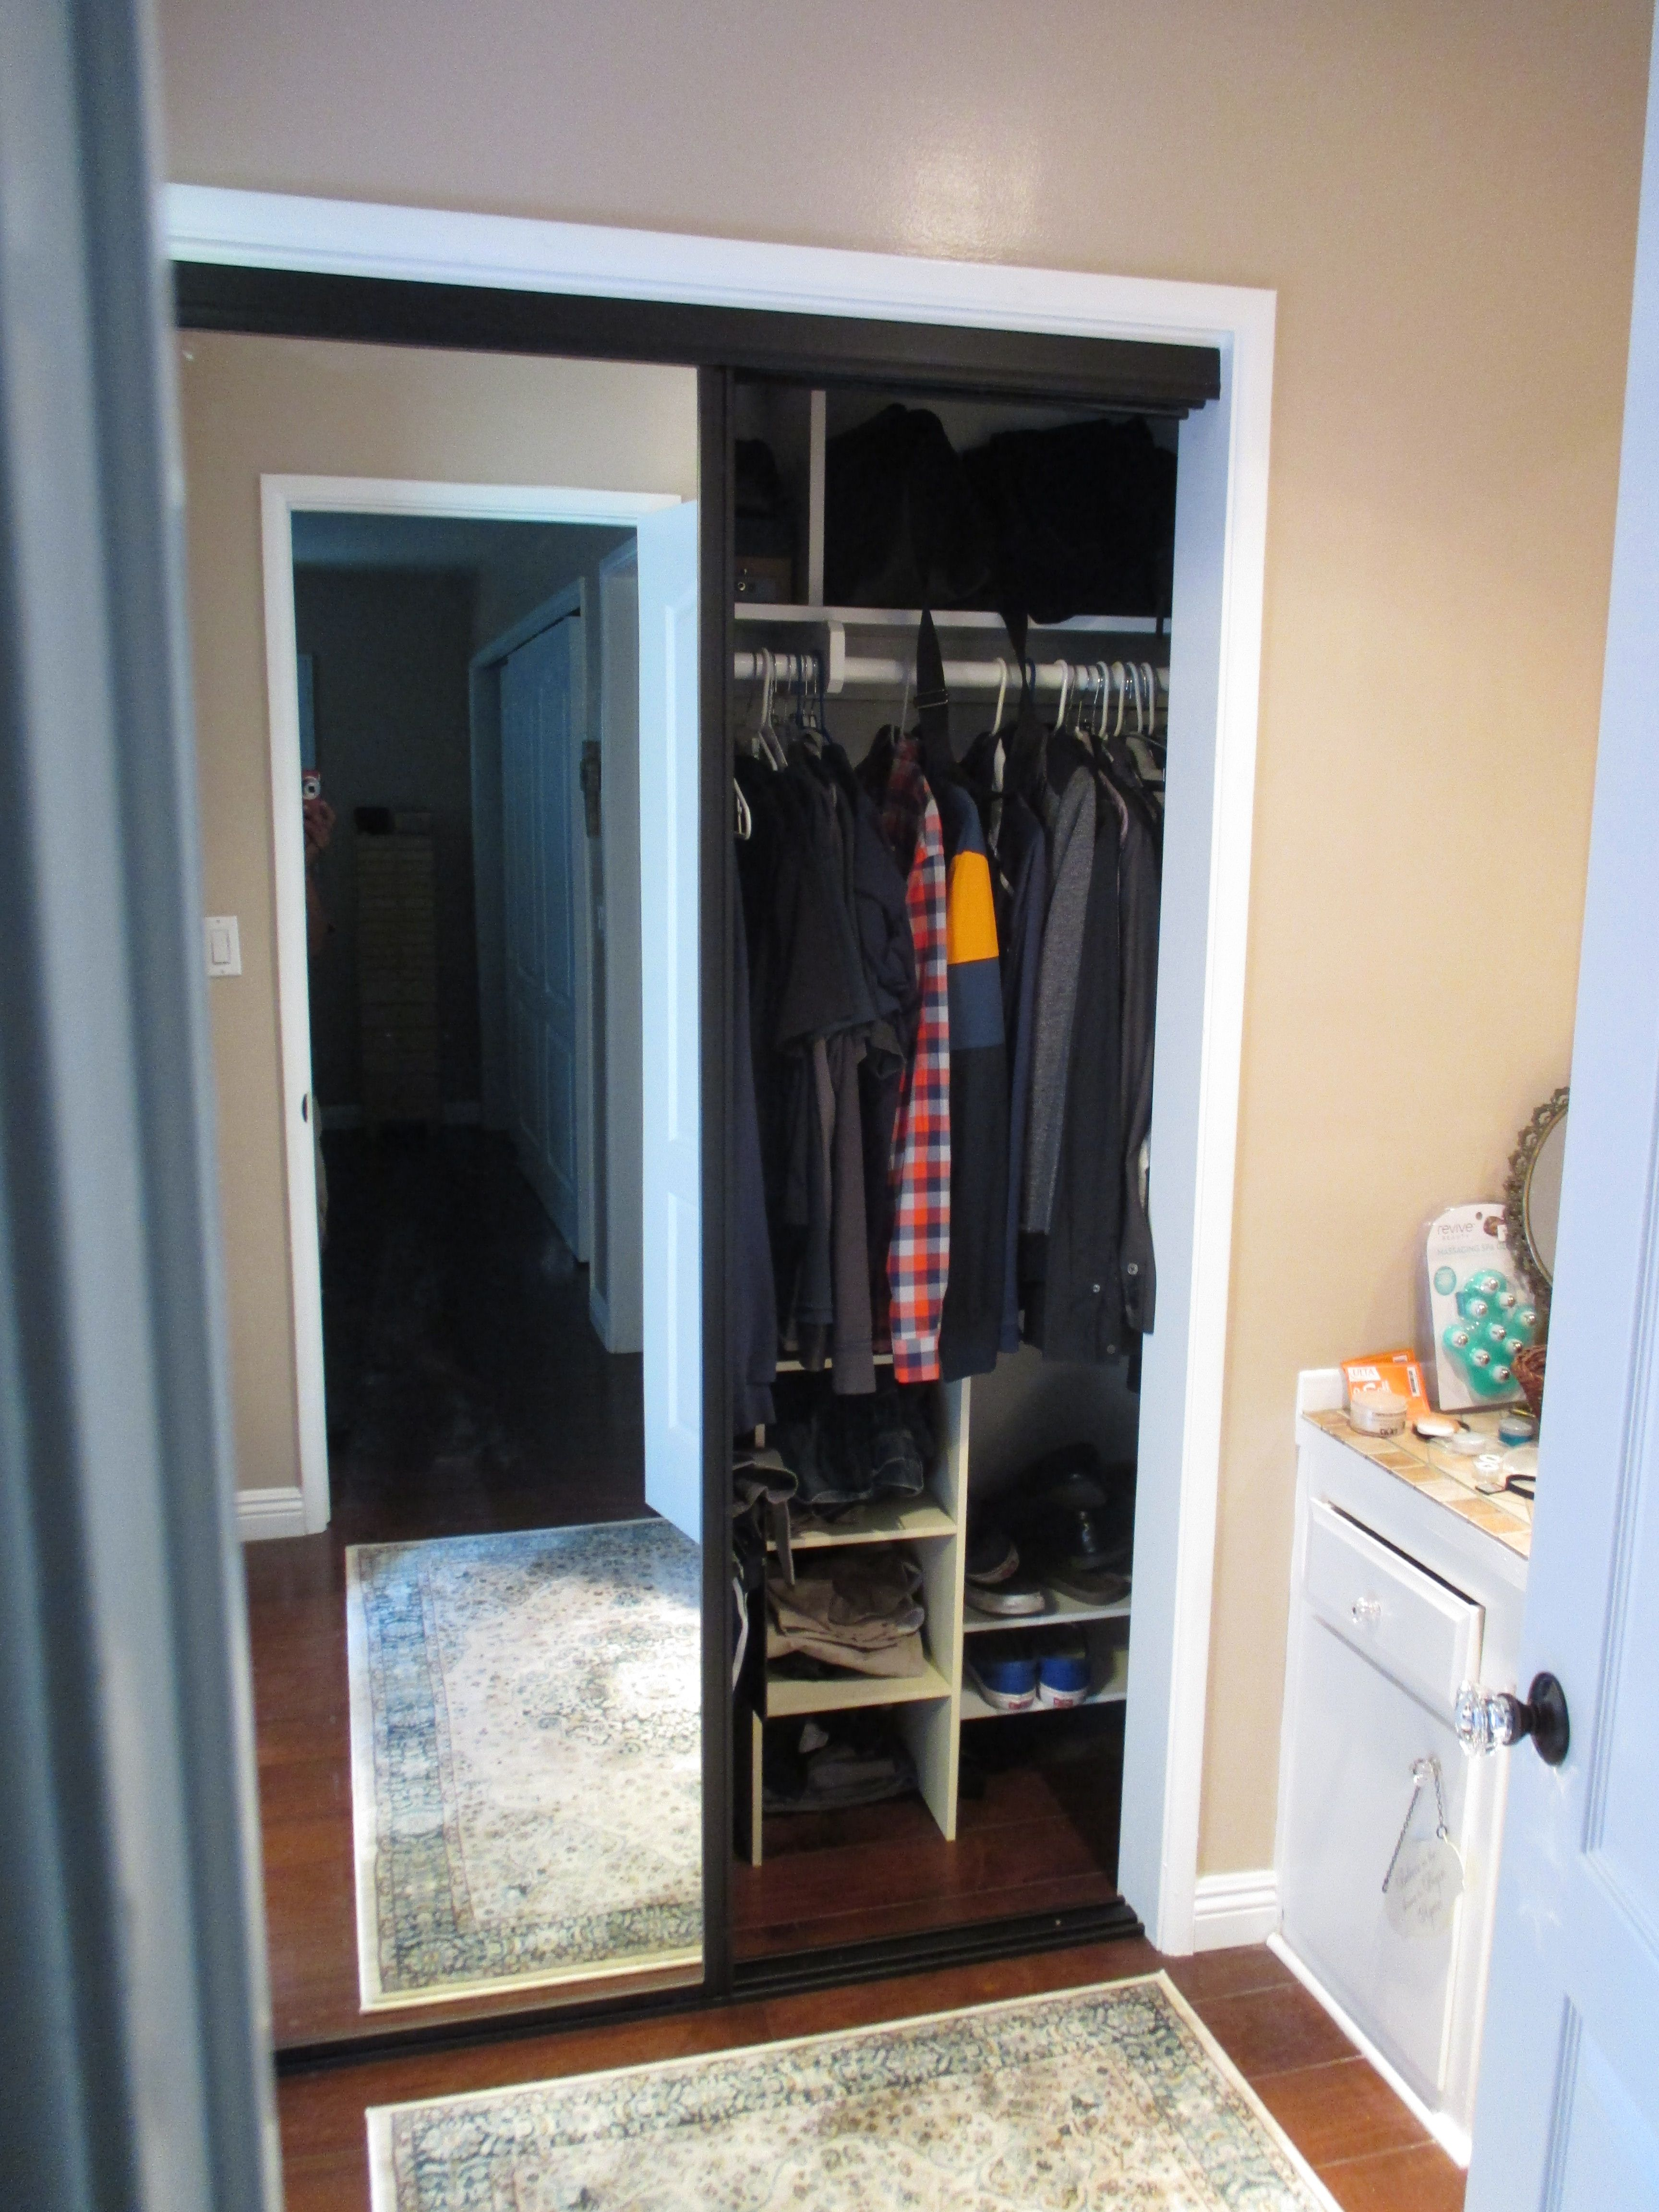 Concord Contractors Wardrobe Bypass Closet Doors. Are You Looking For A  Dark Bronze Aluminum Frame Mirror Panel Sliding Closet Door System?